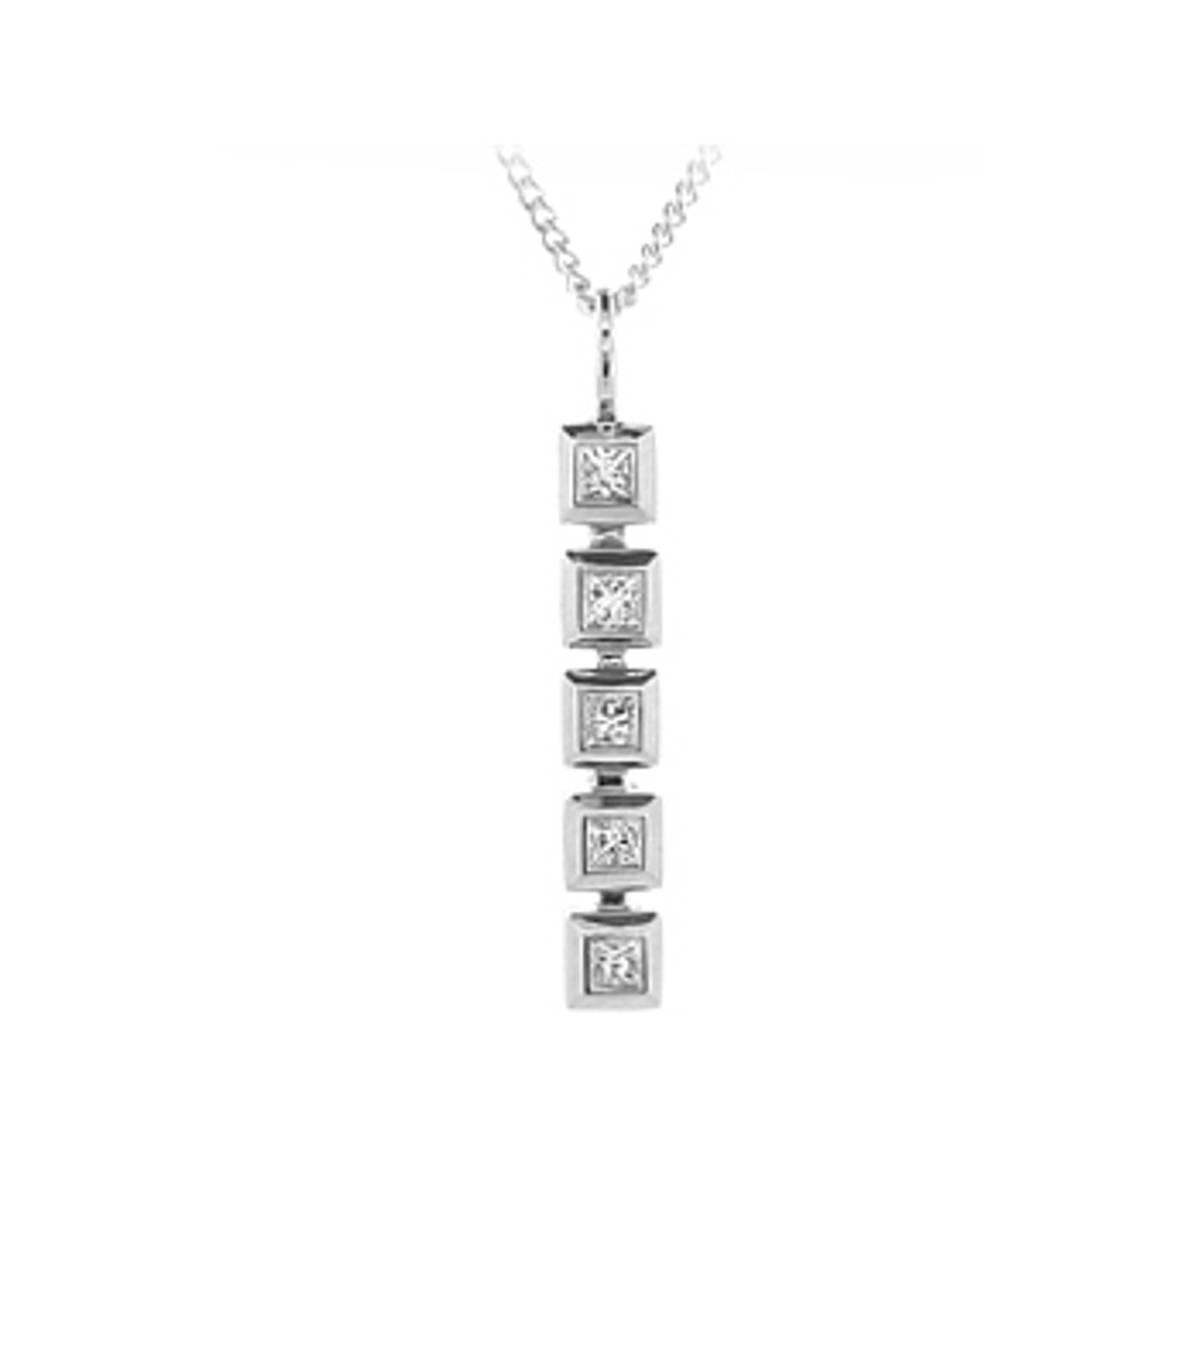 "18k White Gold Princess Cut Diamond RubOver Set Bar Pendant On 18k White Gold 18"" Chain Total Diamond Weight 0.40cts Cut: Princess cut Metal: 18k White Gold"